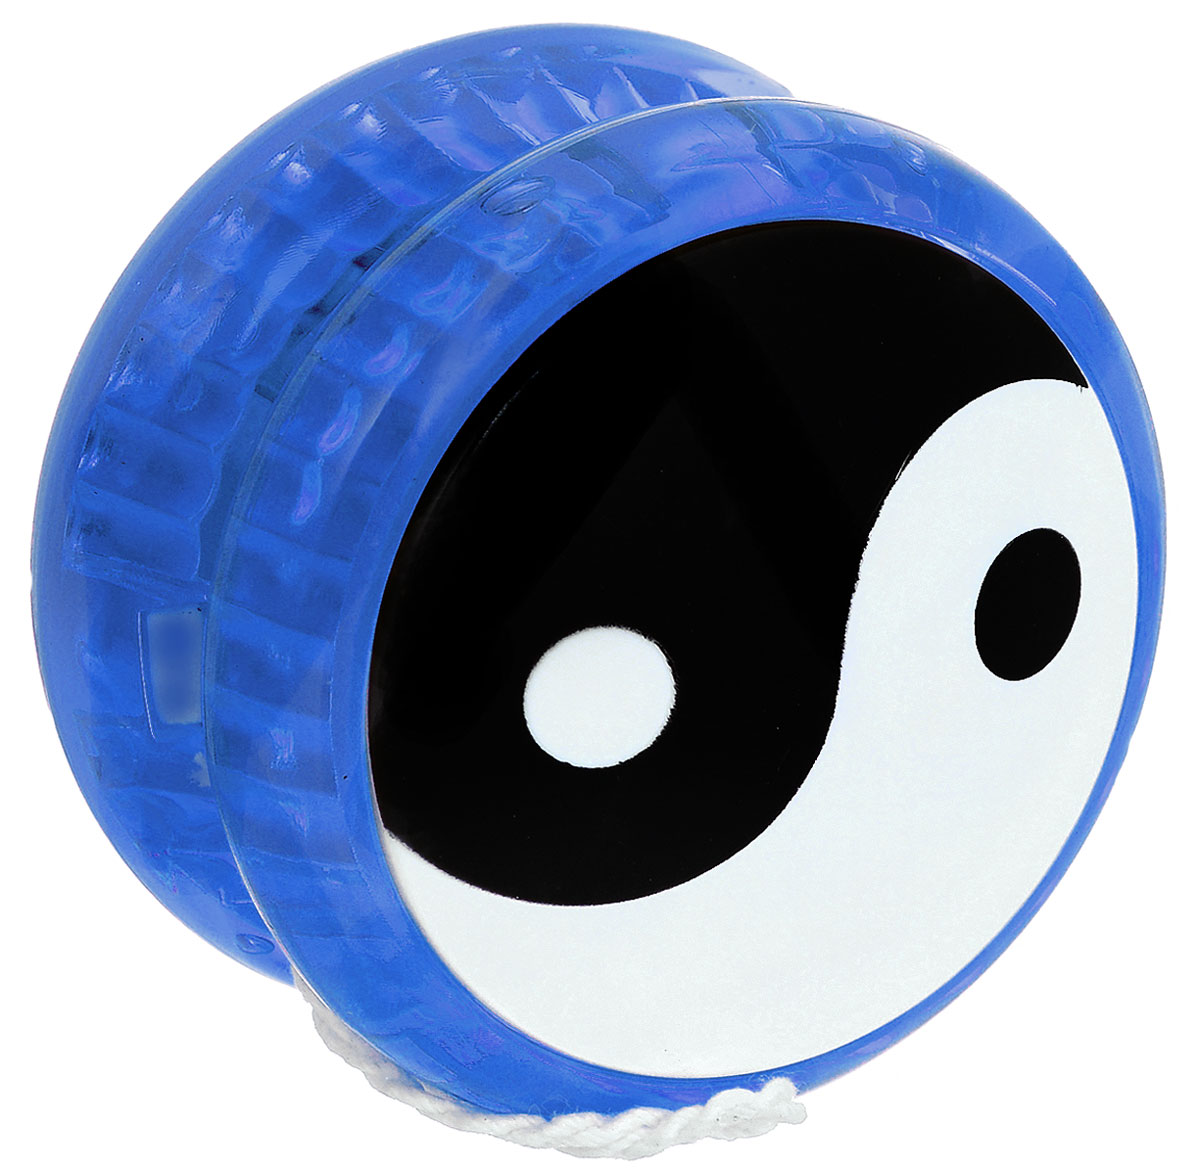 Эврика Йо-йо Инь-Ян цвет синий игрушка йо йо 1 toy на палец